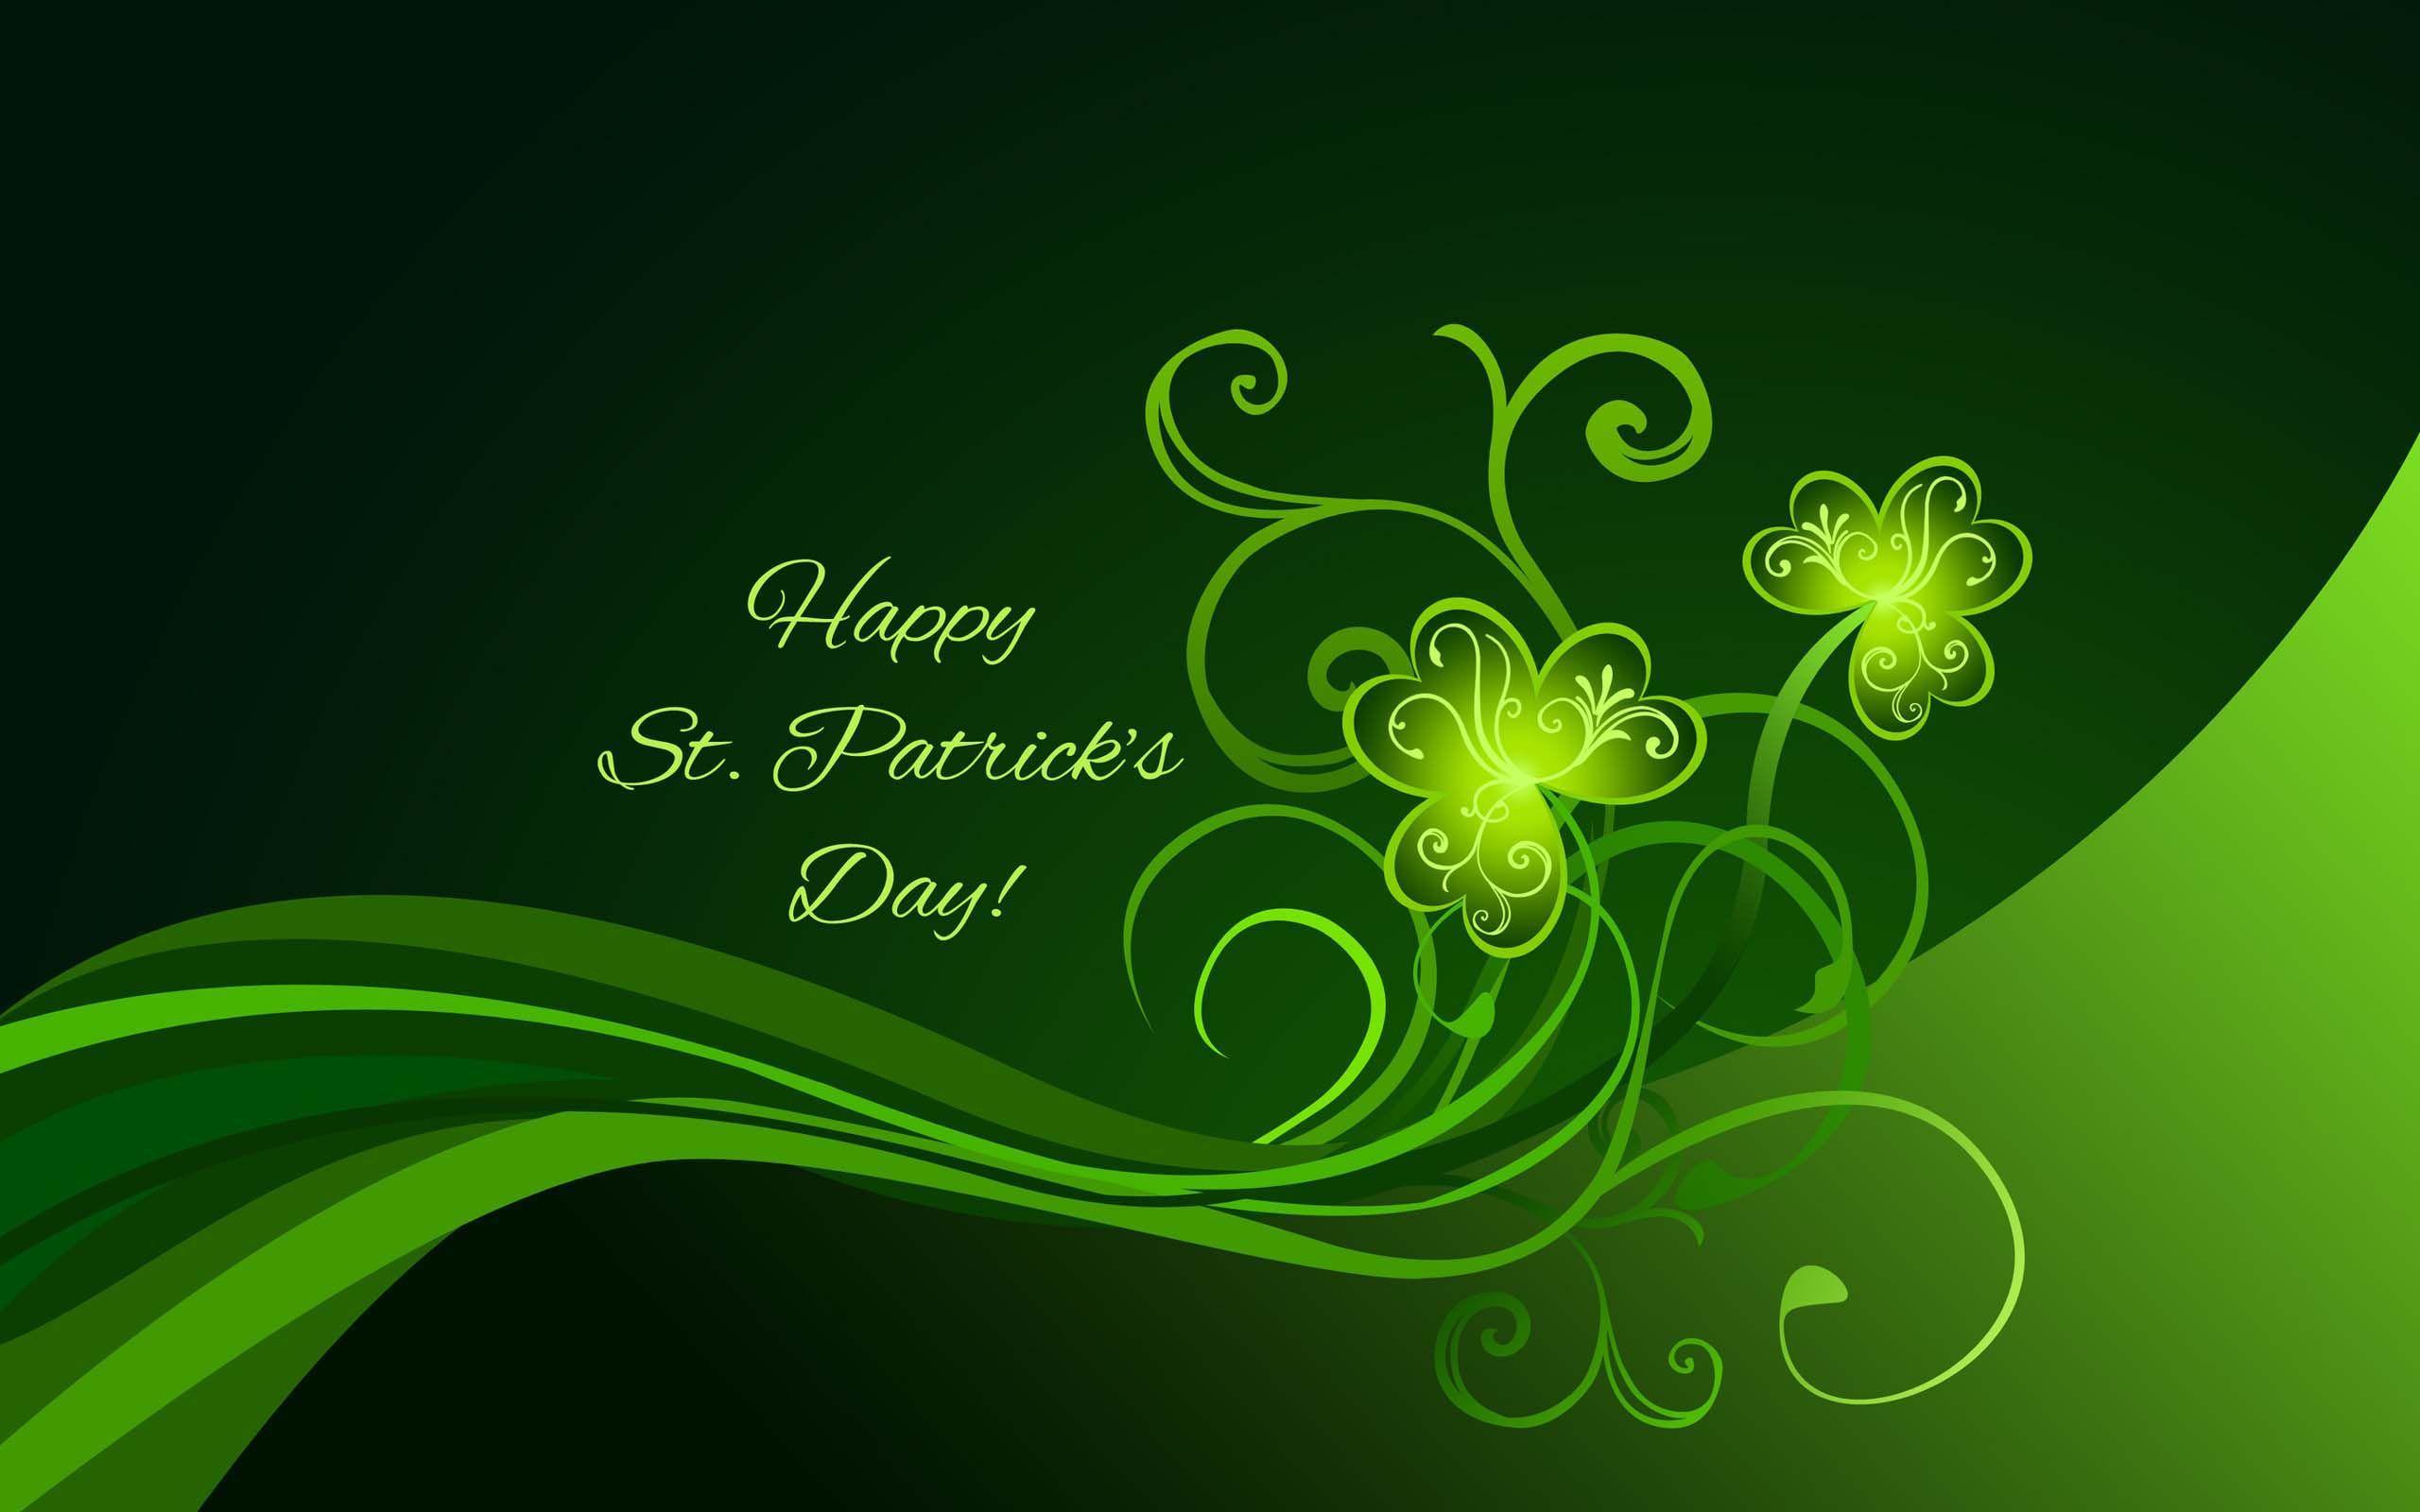 St Patricks Day HD Wallpaper Free